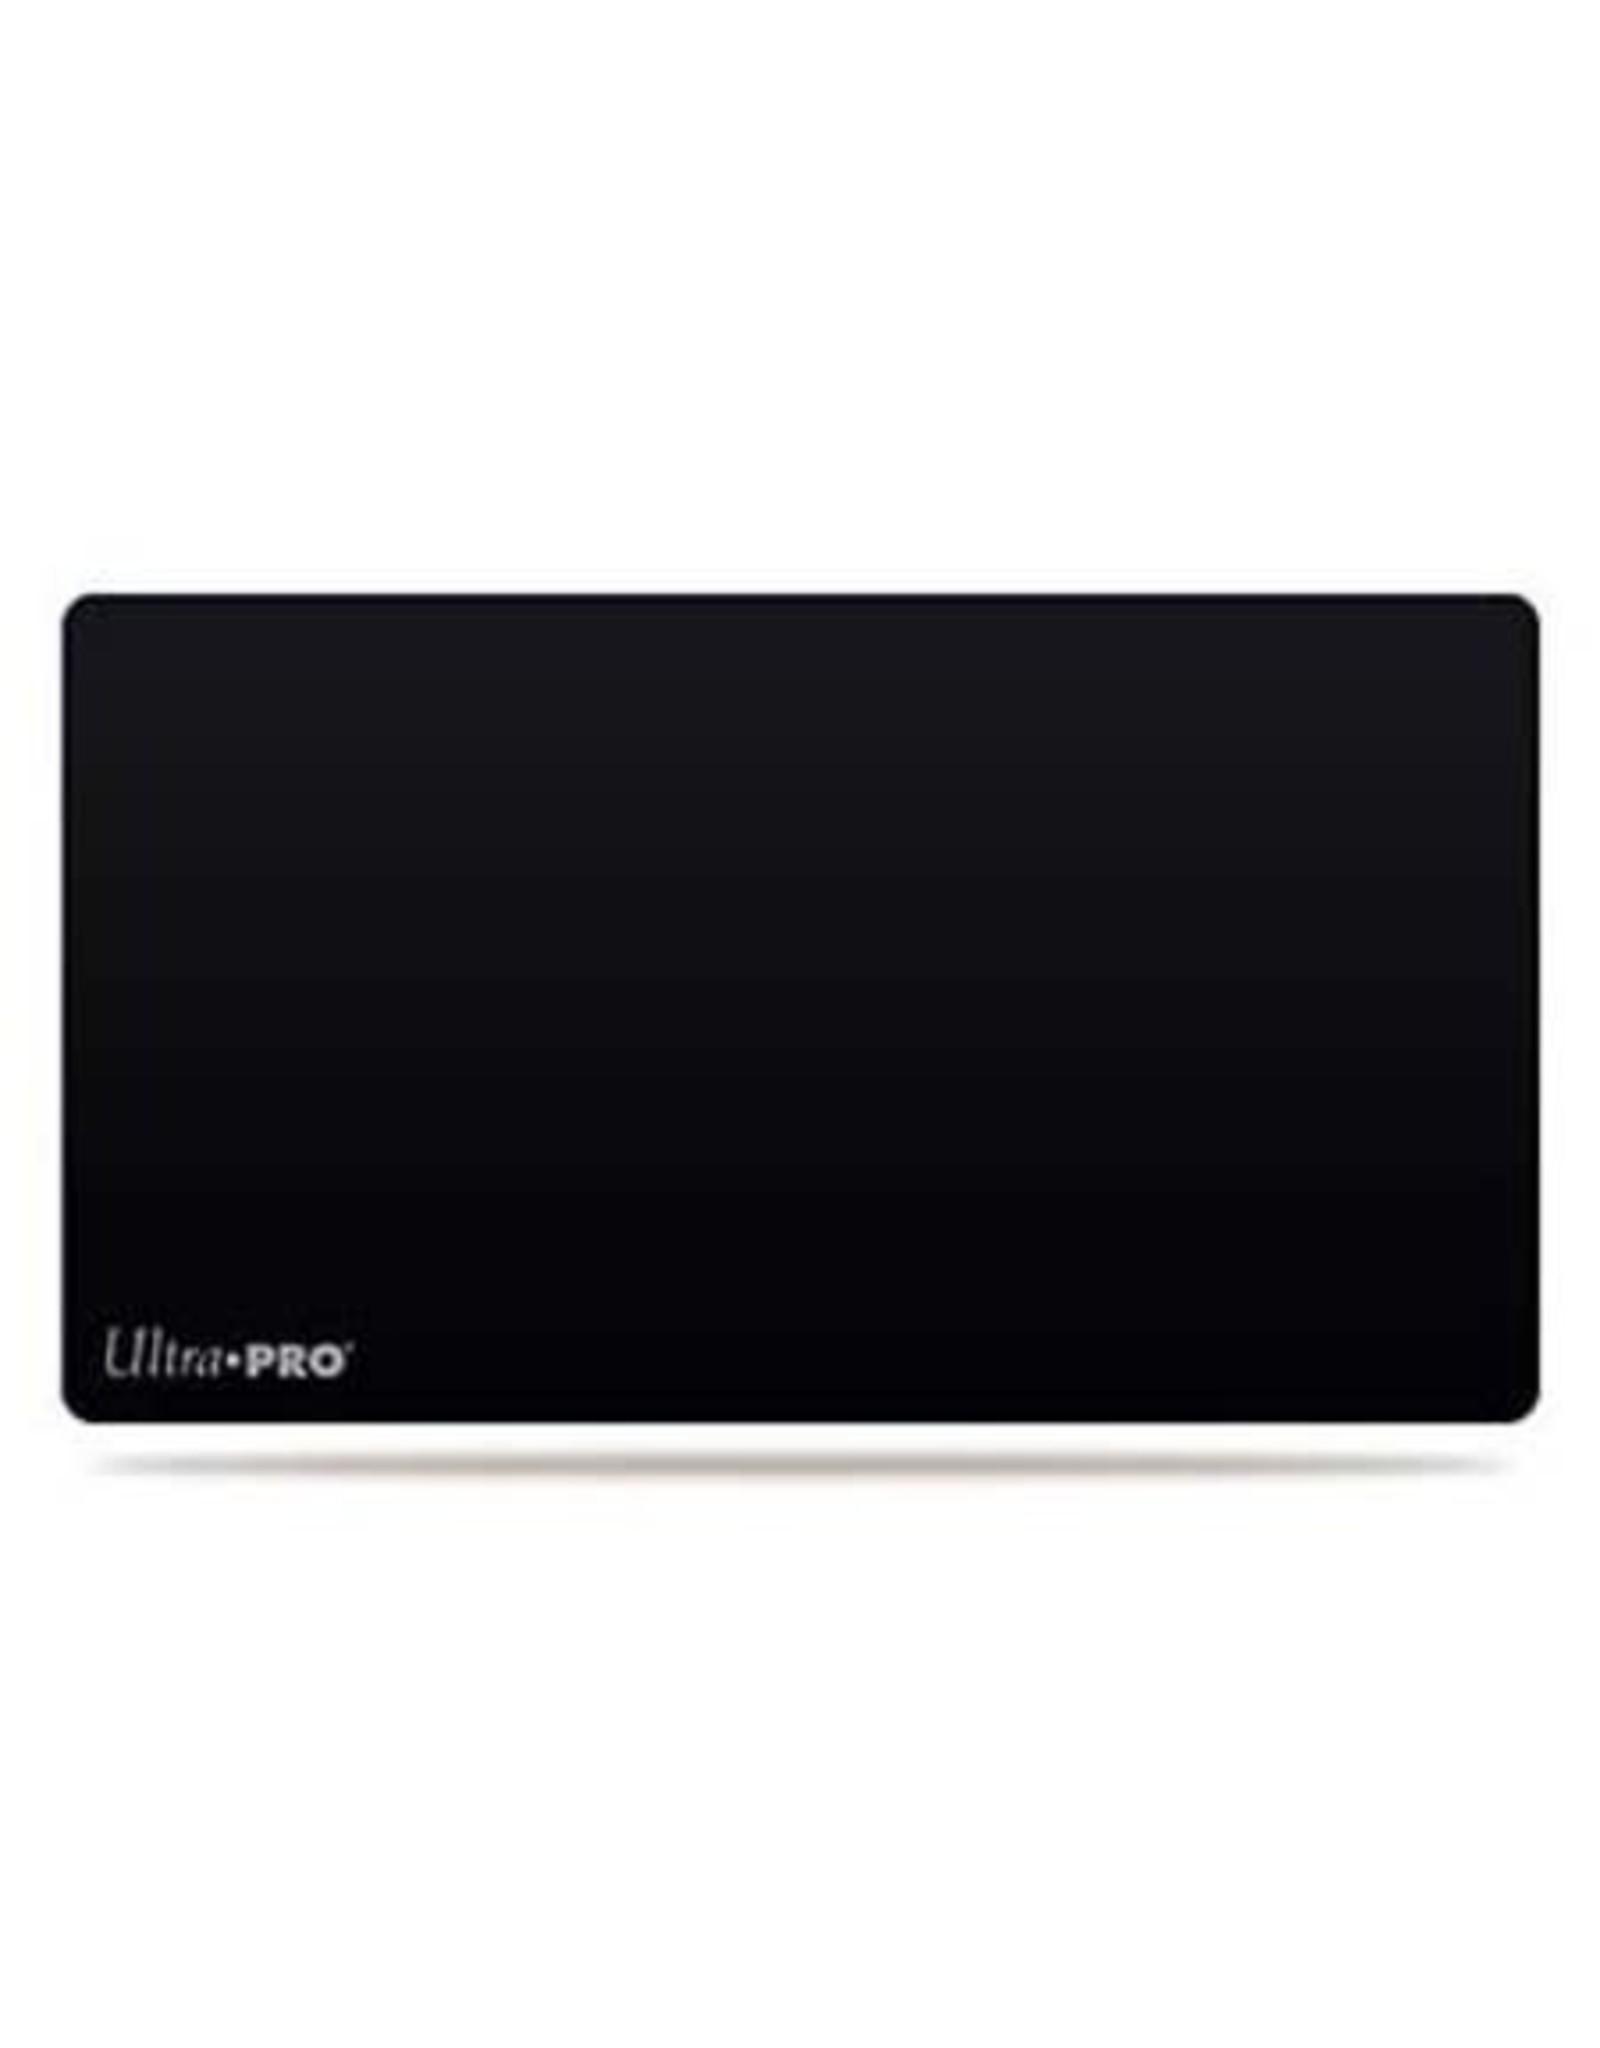 Ultra Pro Black Playmat